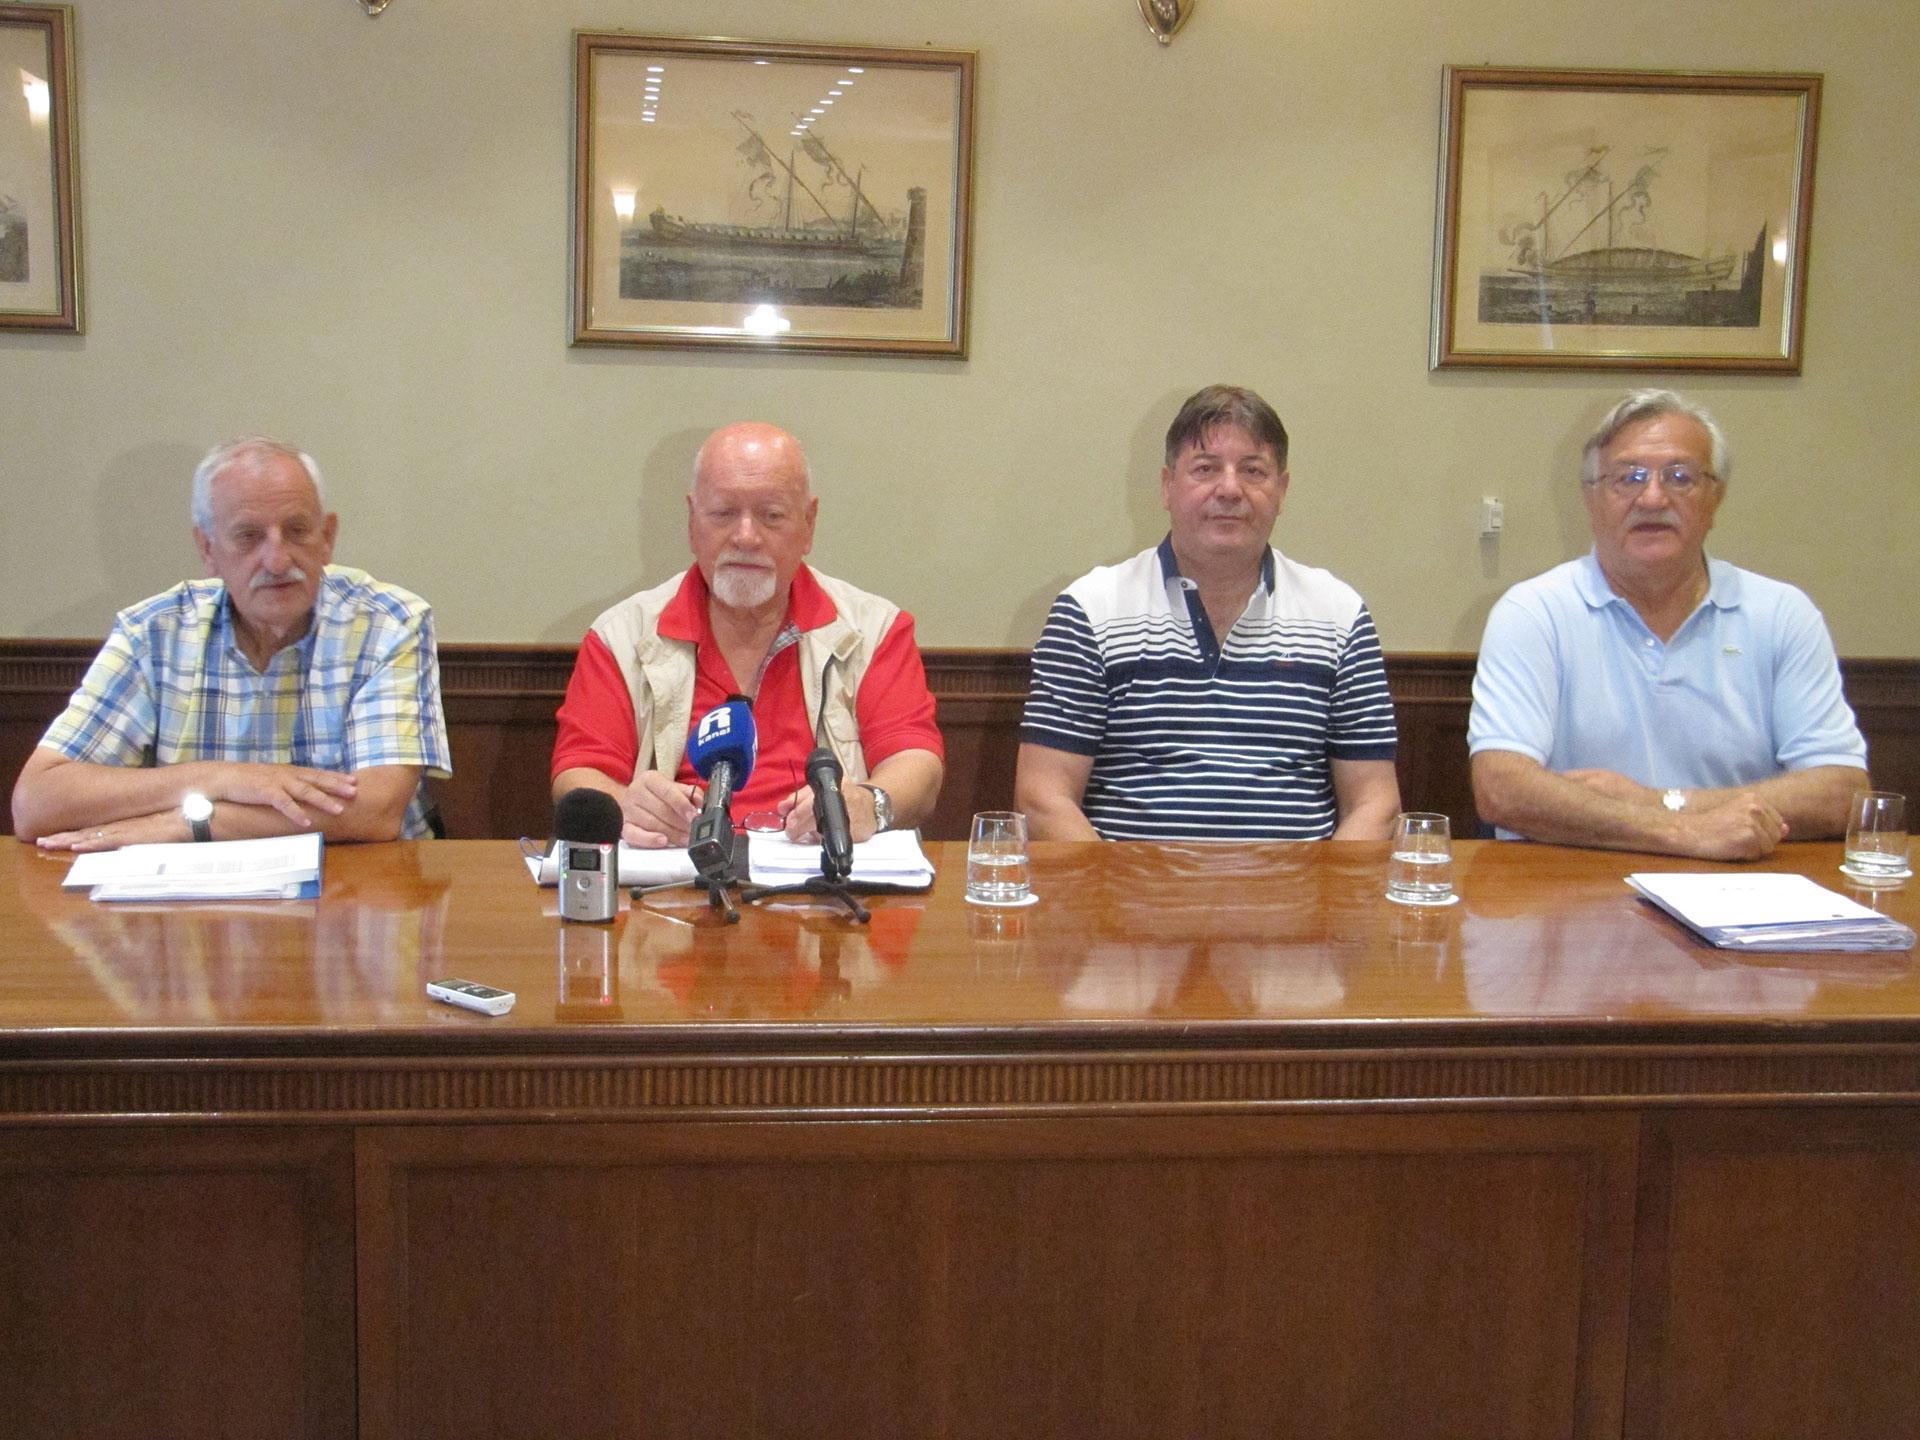 Igor Eškinja, Mladen Črnjar, Zdenko Šantić i Vladimir Vujnović (snimio M.Krpan)